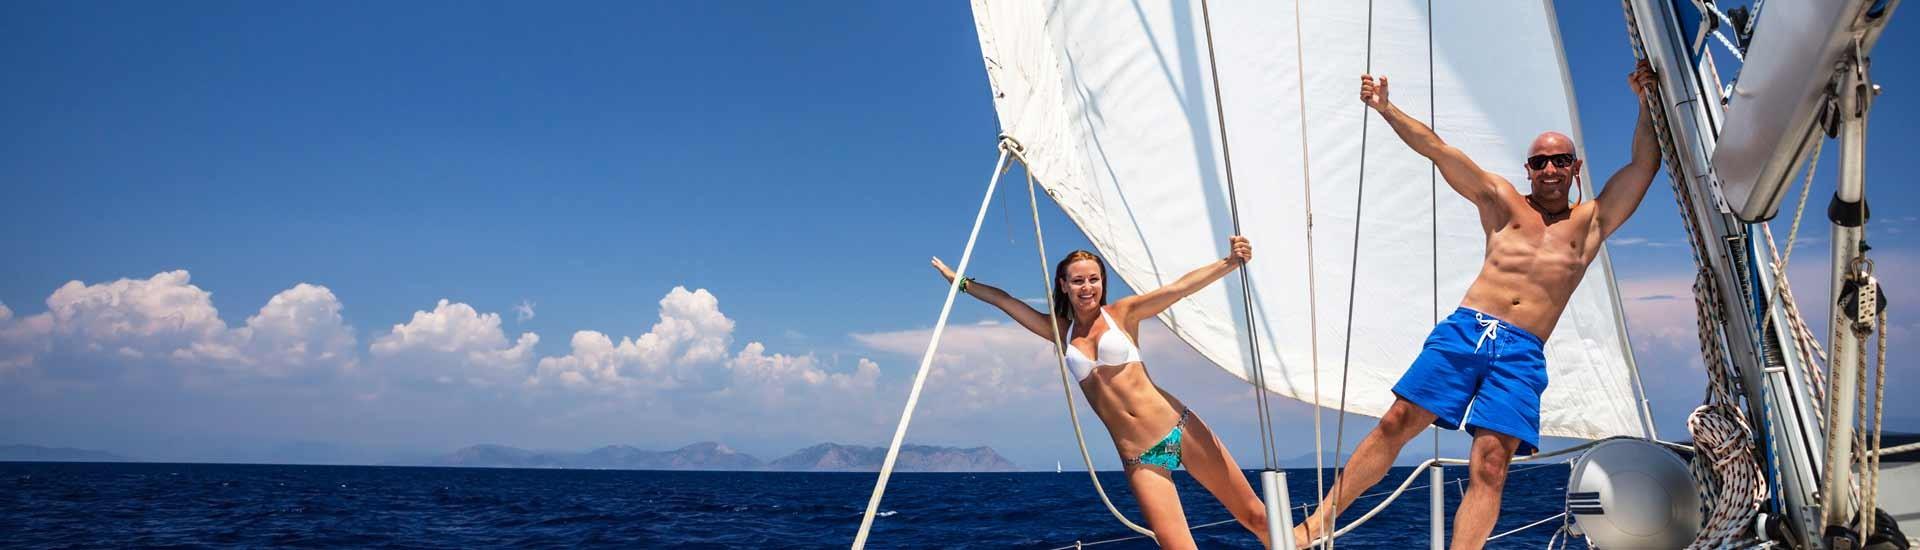 Веселитесь на парусной яхте